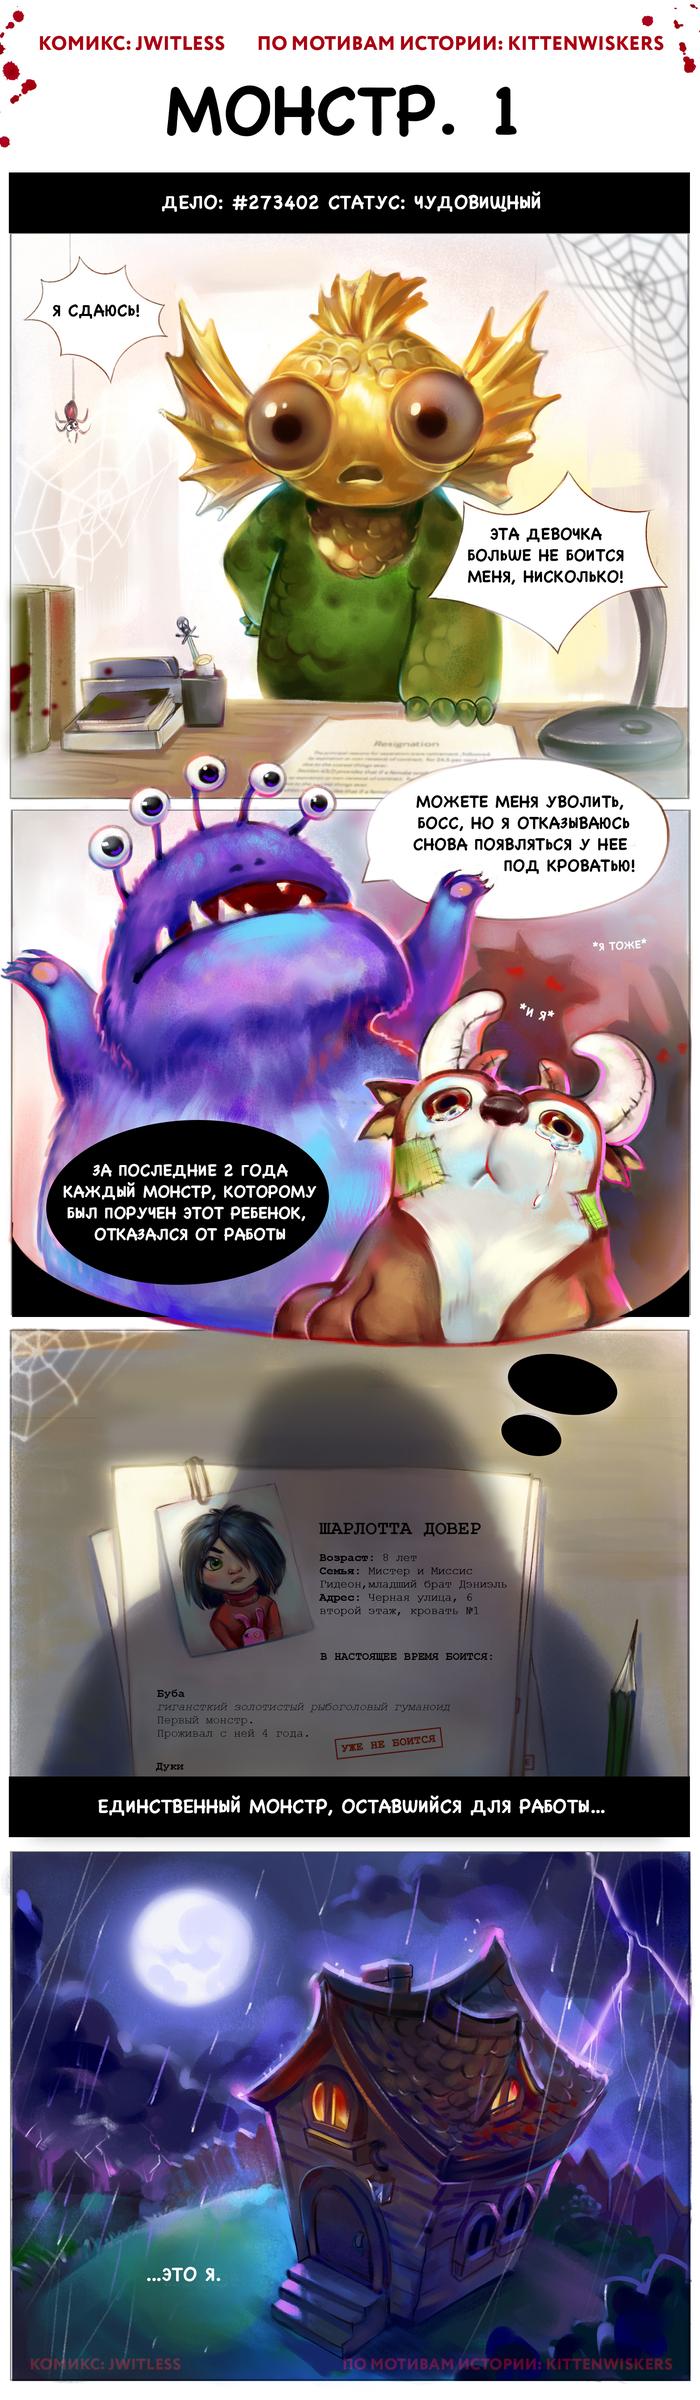 Монстр. Часть 1 Комиксы, Веб-Комикс, Рисунок, Монстр, Детство, Арт, Jwitless, Длиннопост